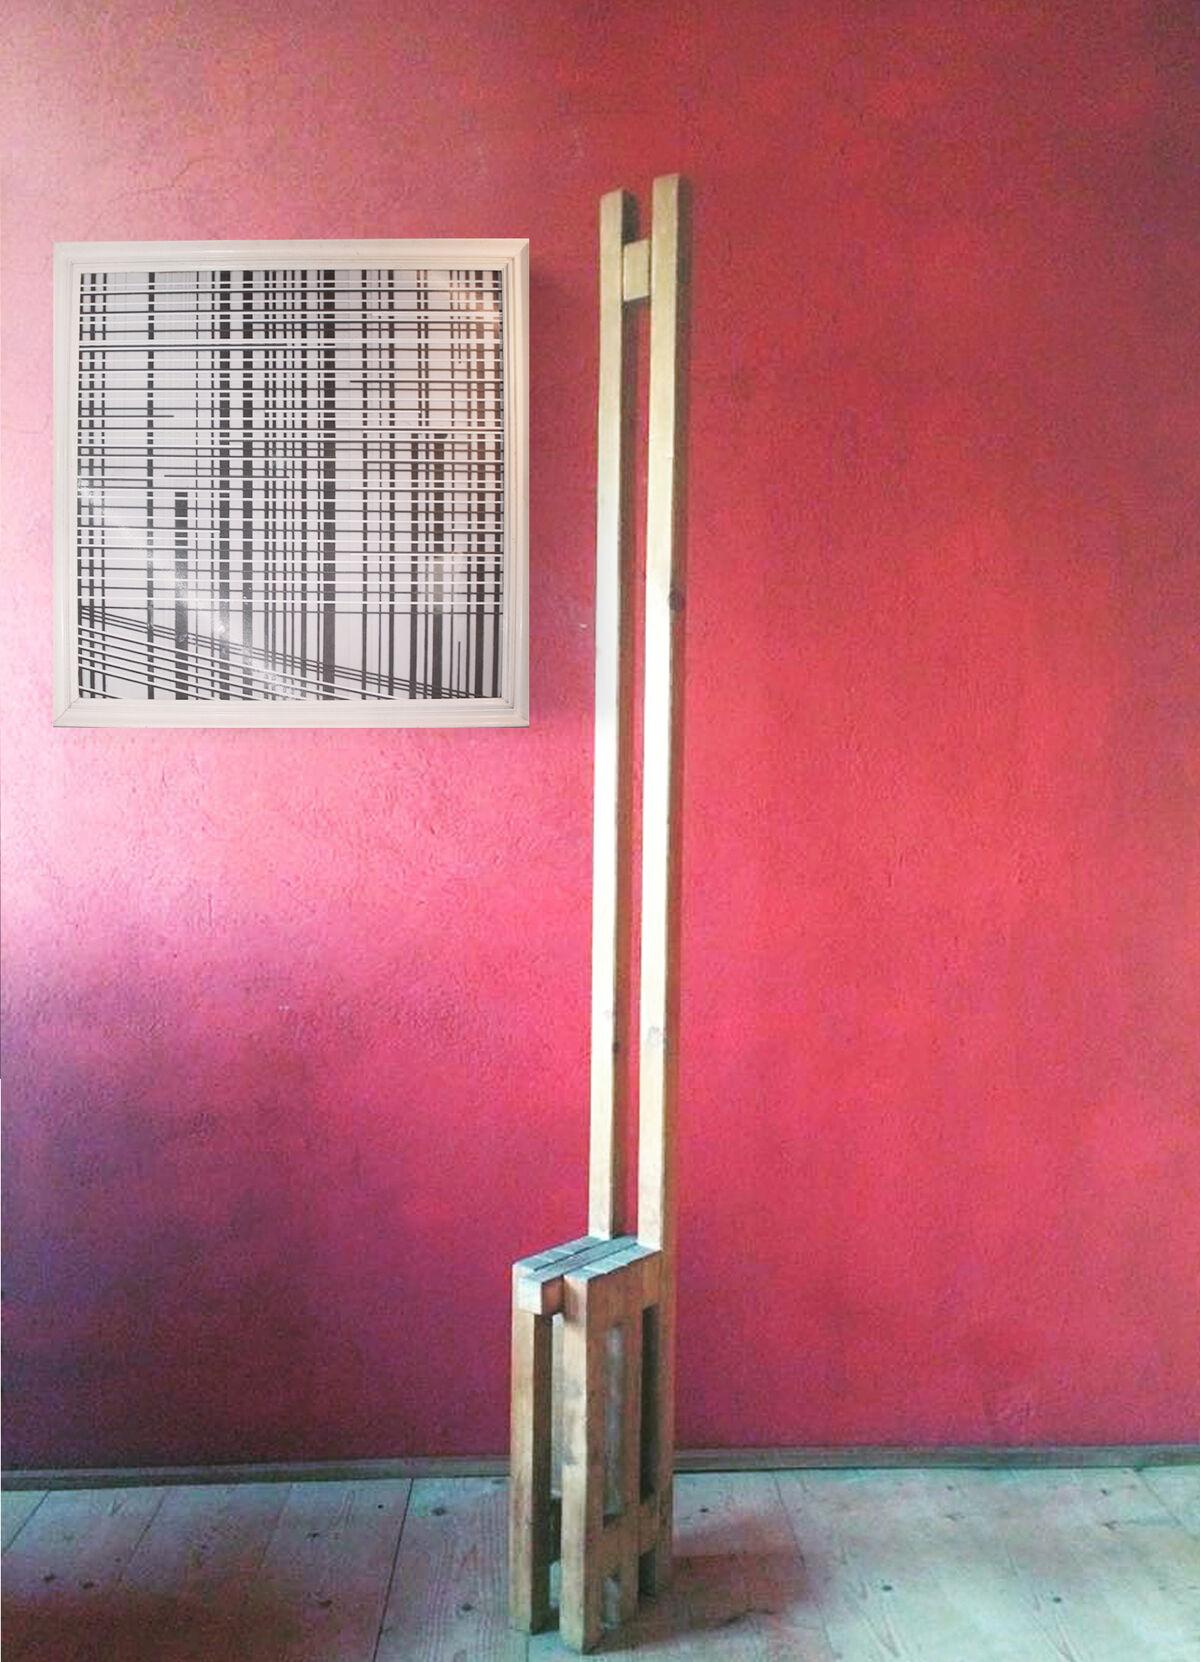 Uranoide trone by Urano Palma 1978 at Erastudio Apartment-Gallery Courtesy of Erastudio Apartment-Gallery.